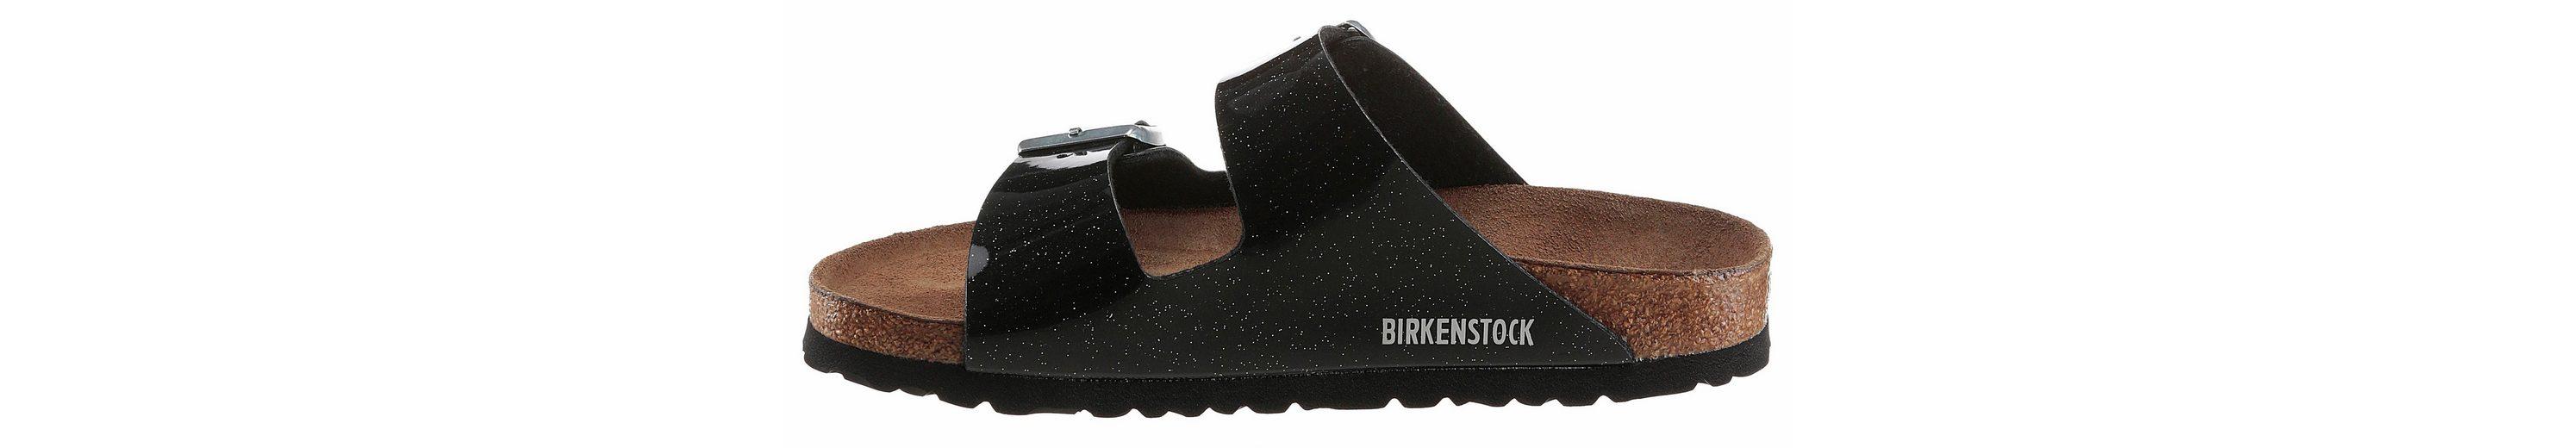 Birkenstock ARIZONA SFB Pantolette, in glitzernder Optik